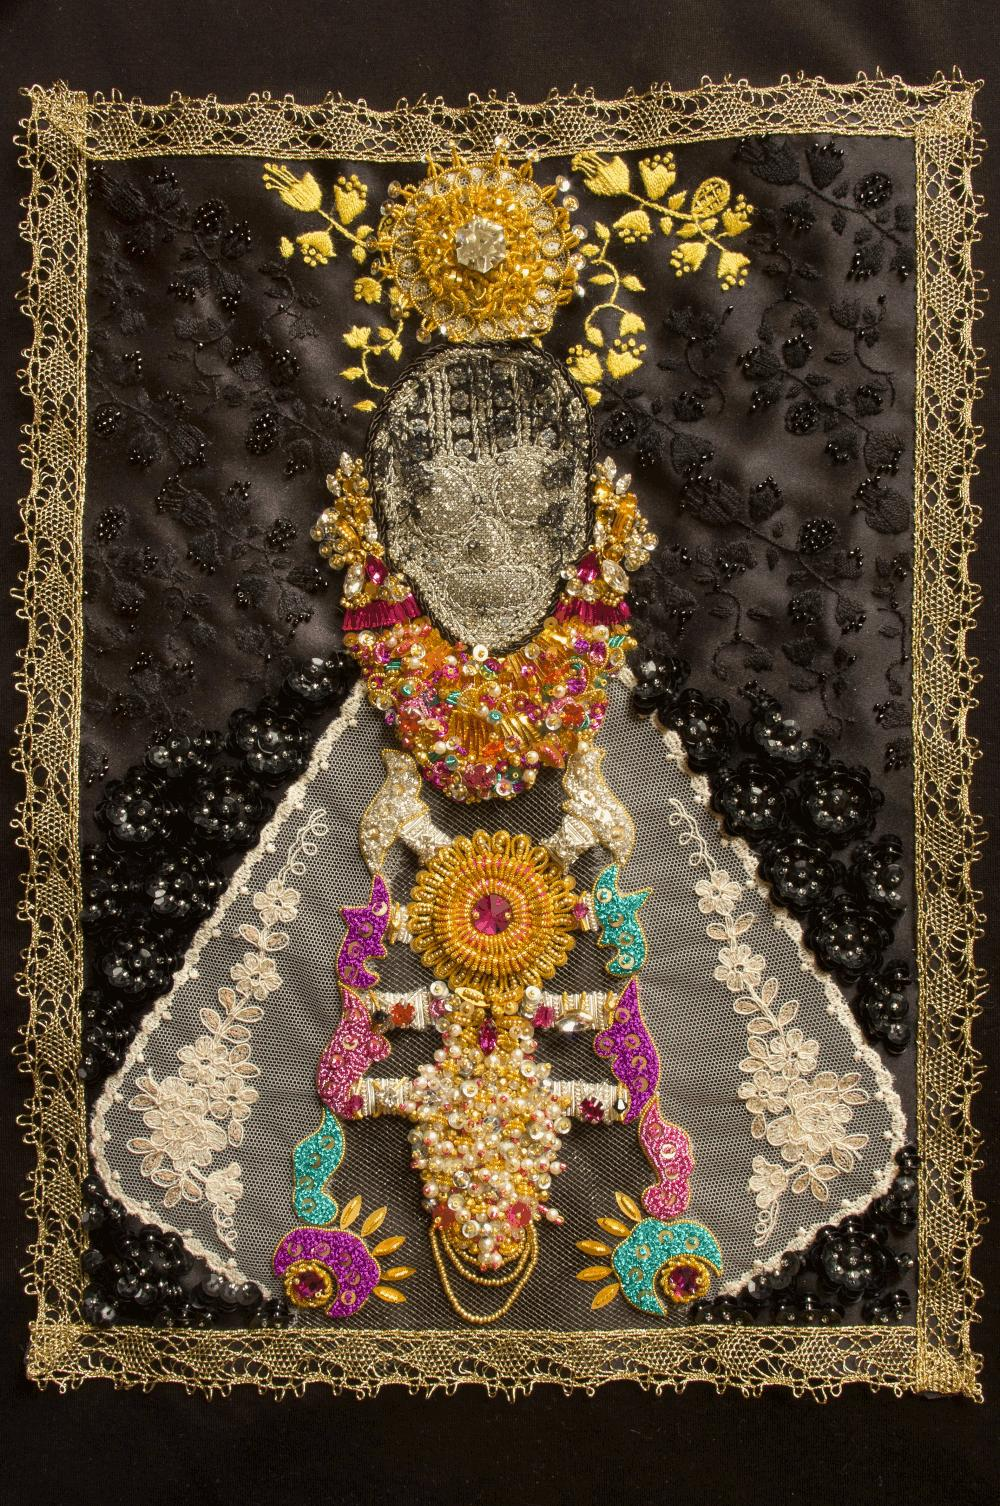 Mary Brown – 'Embellished Saint' - Sydney 2019